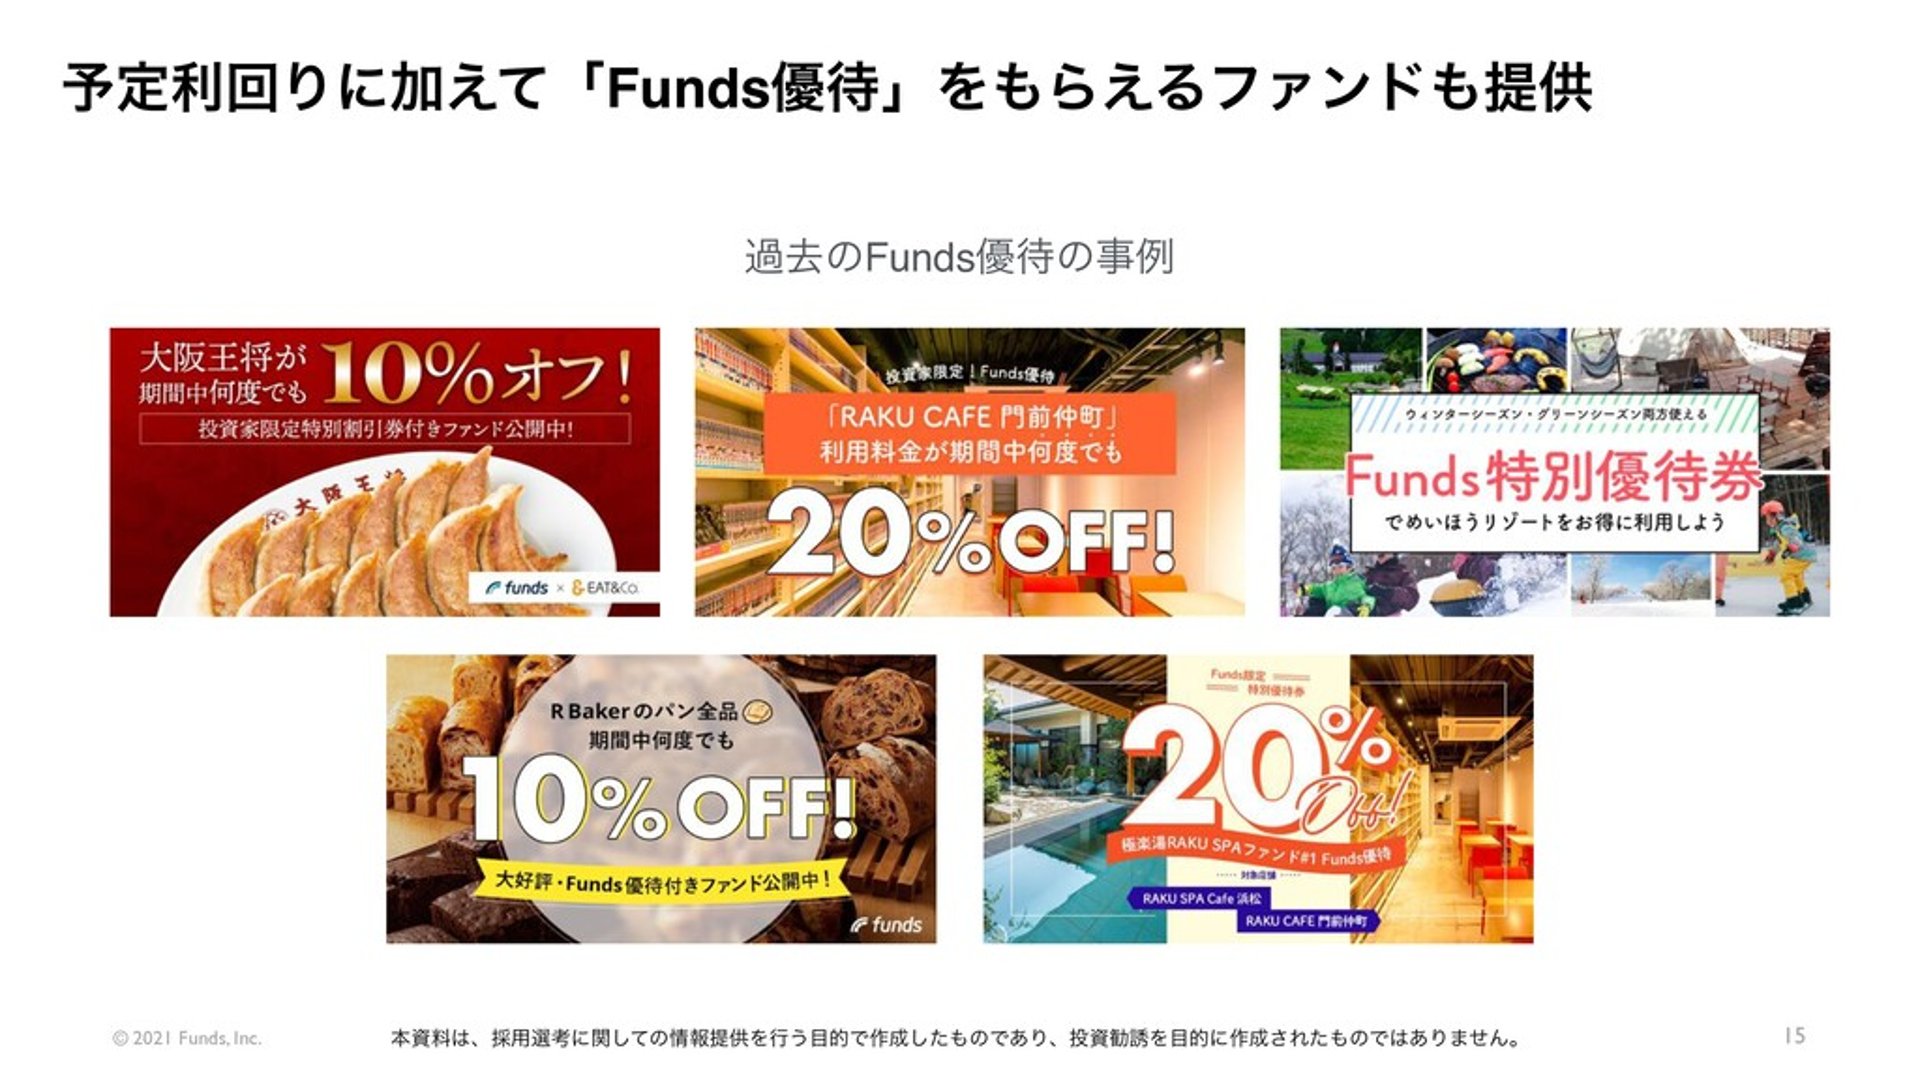 © 2021 Funds, Inc. ༧ఆརճΓʹՃ͑ͯʮFunds༏ʯΛΒ͑ΔϑΝϯυ...